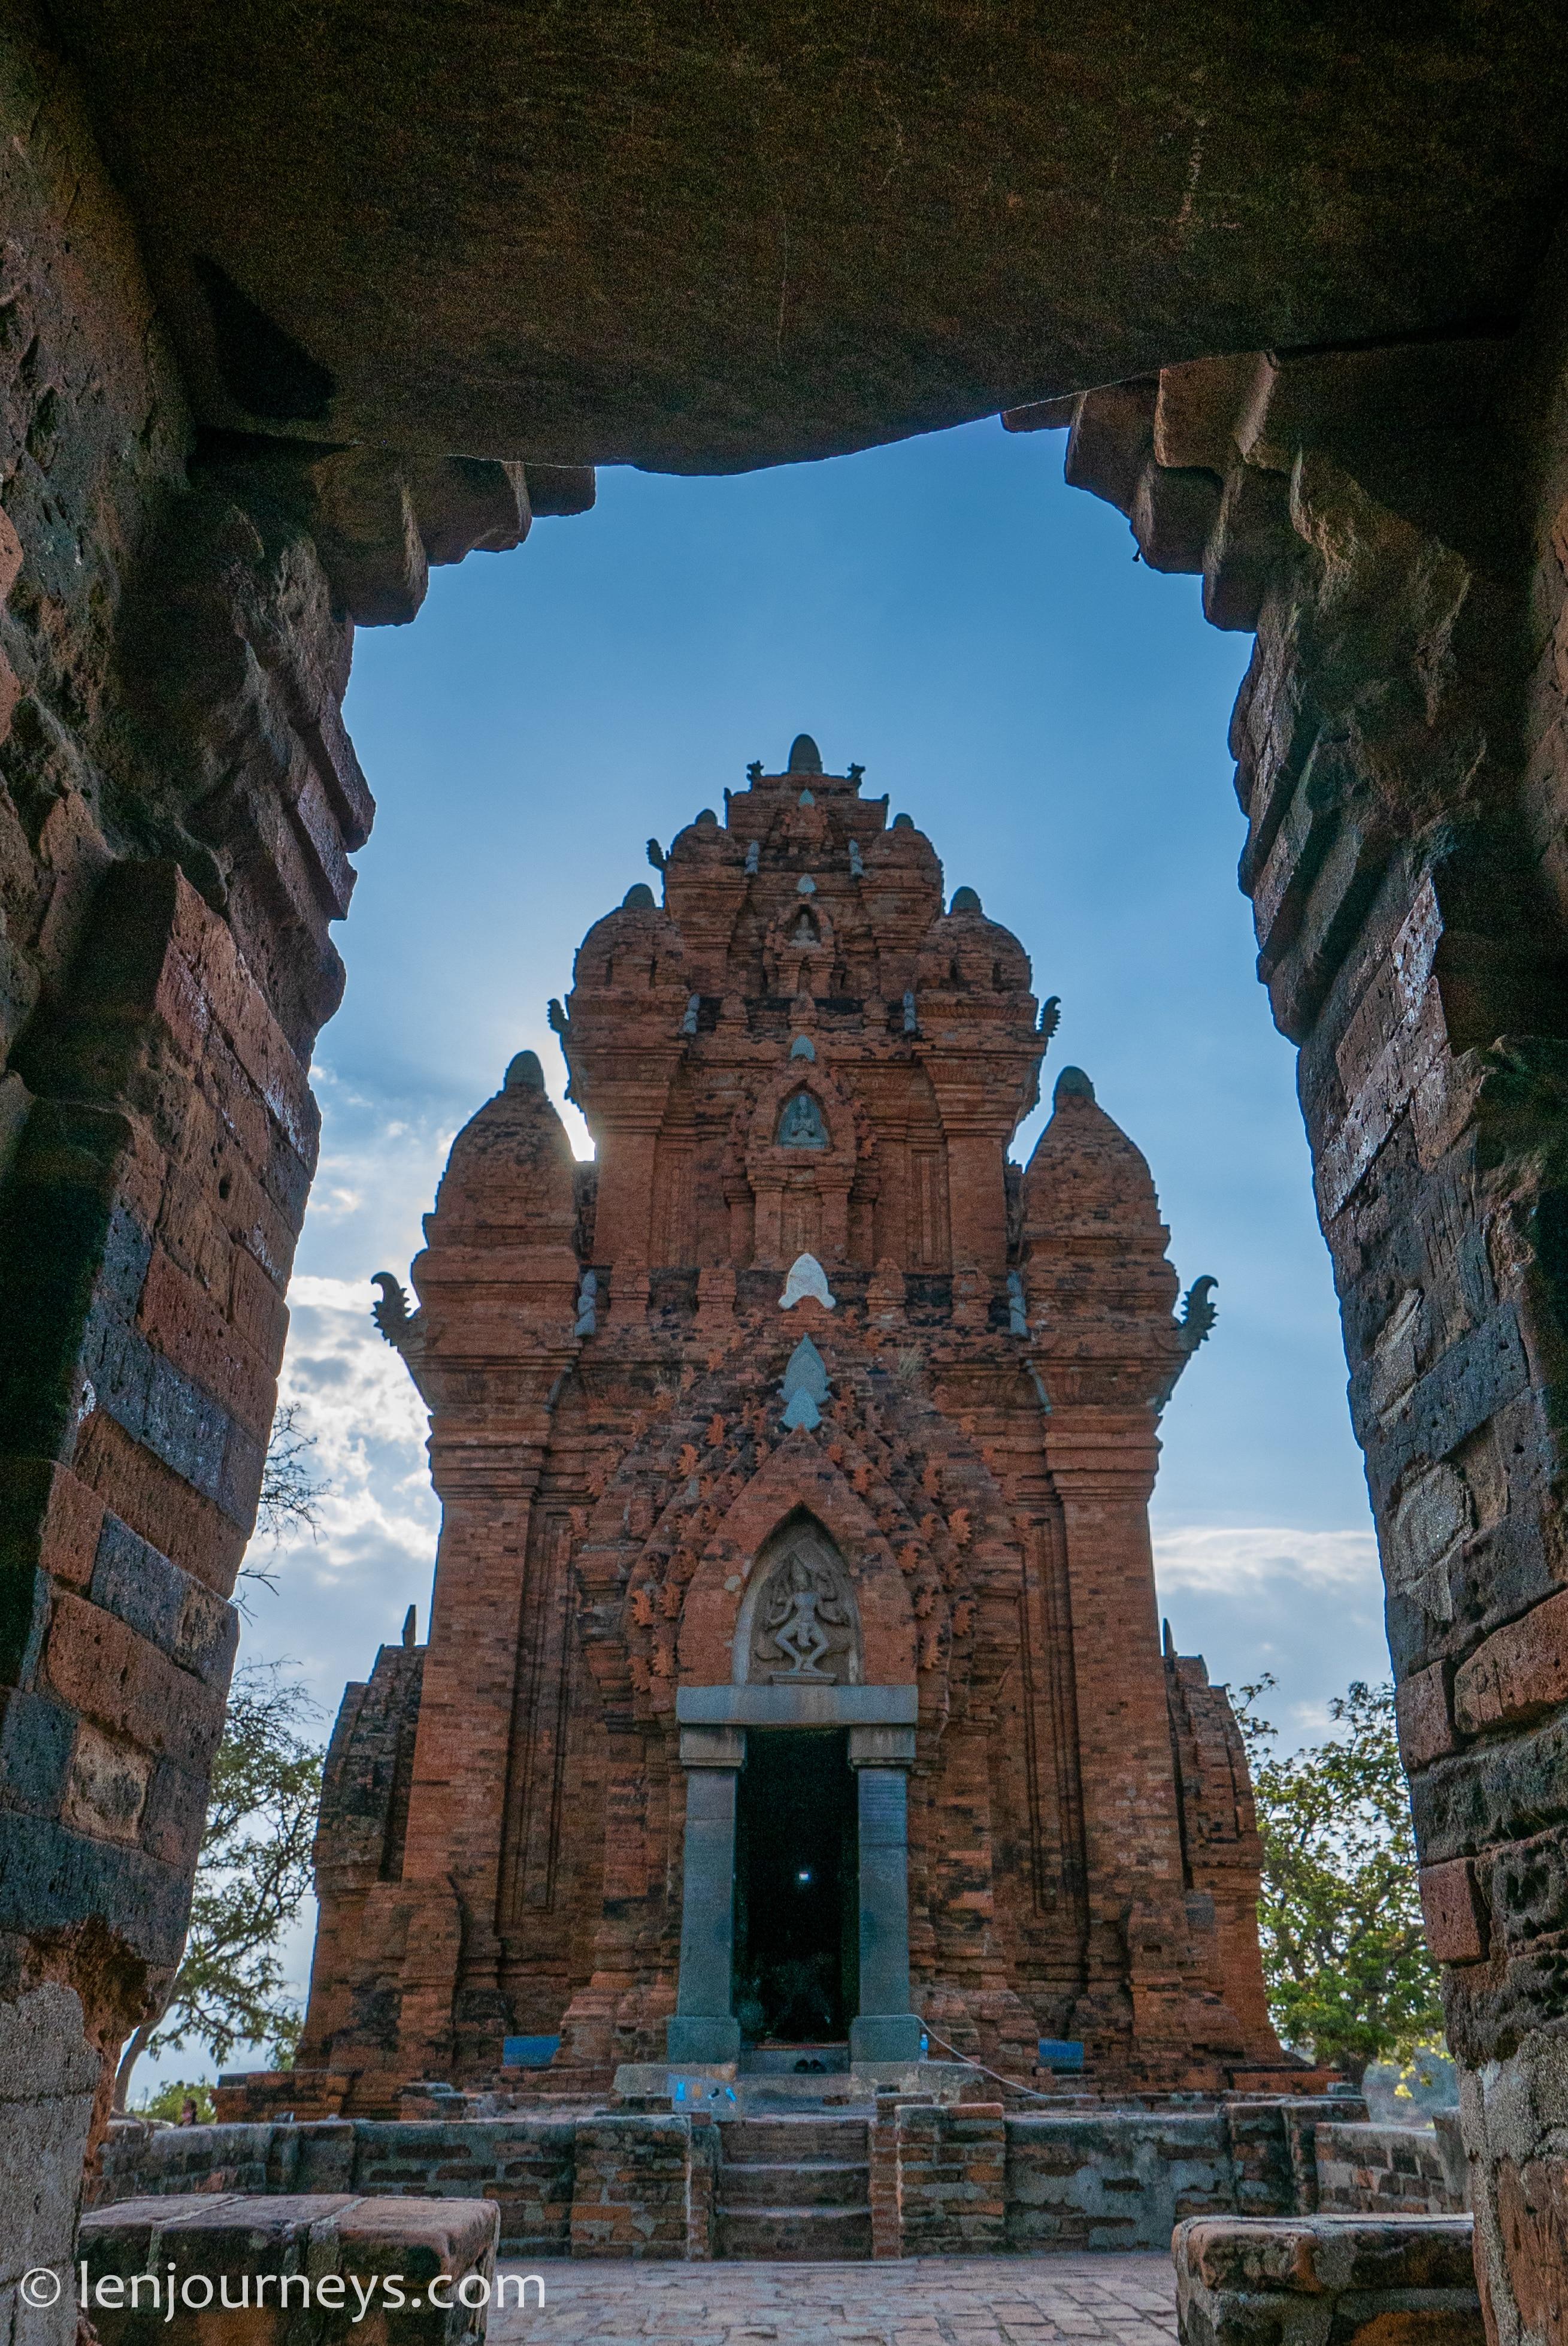 Po Klong Garai central tower